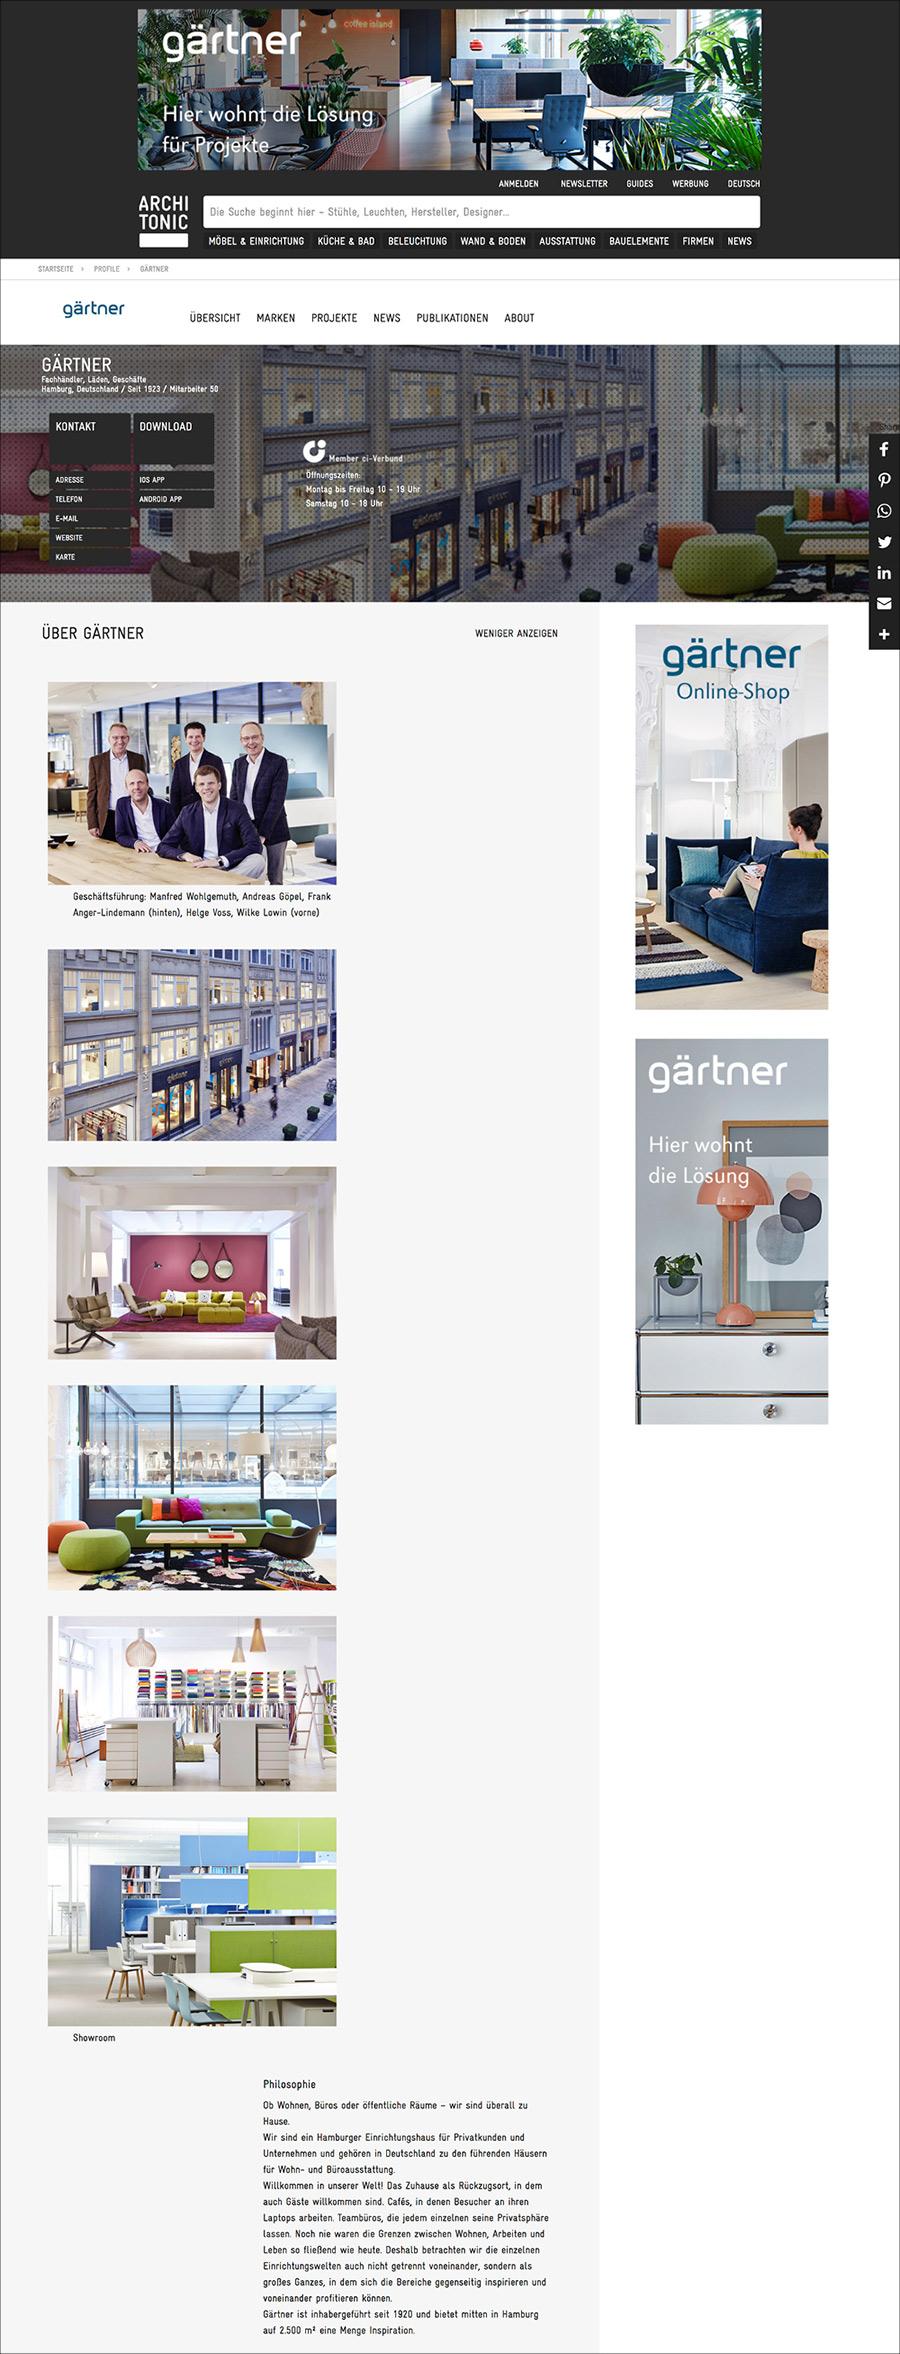 retailers_membership_showroom_de.jpg